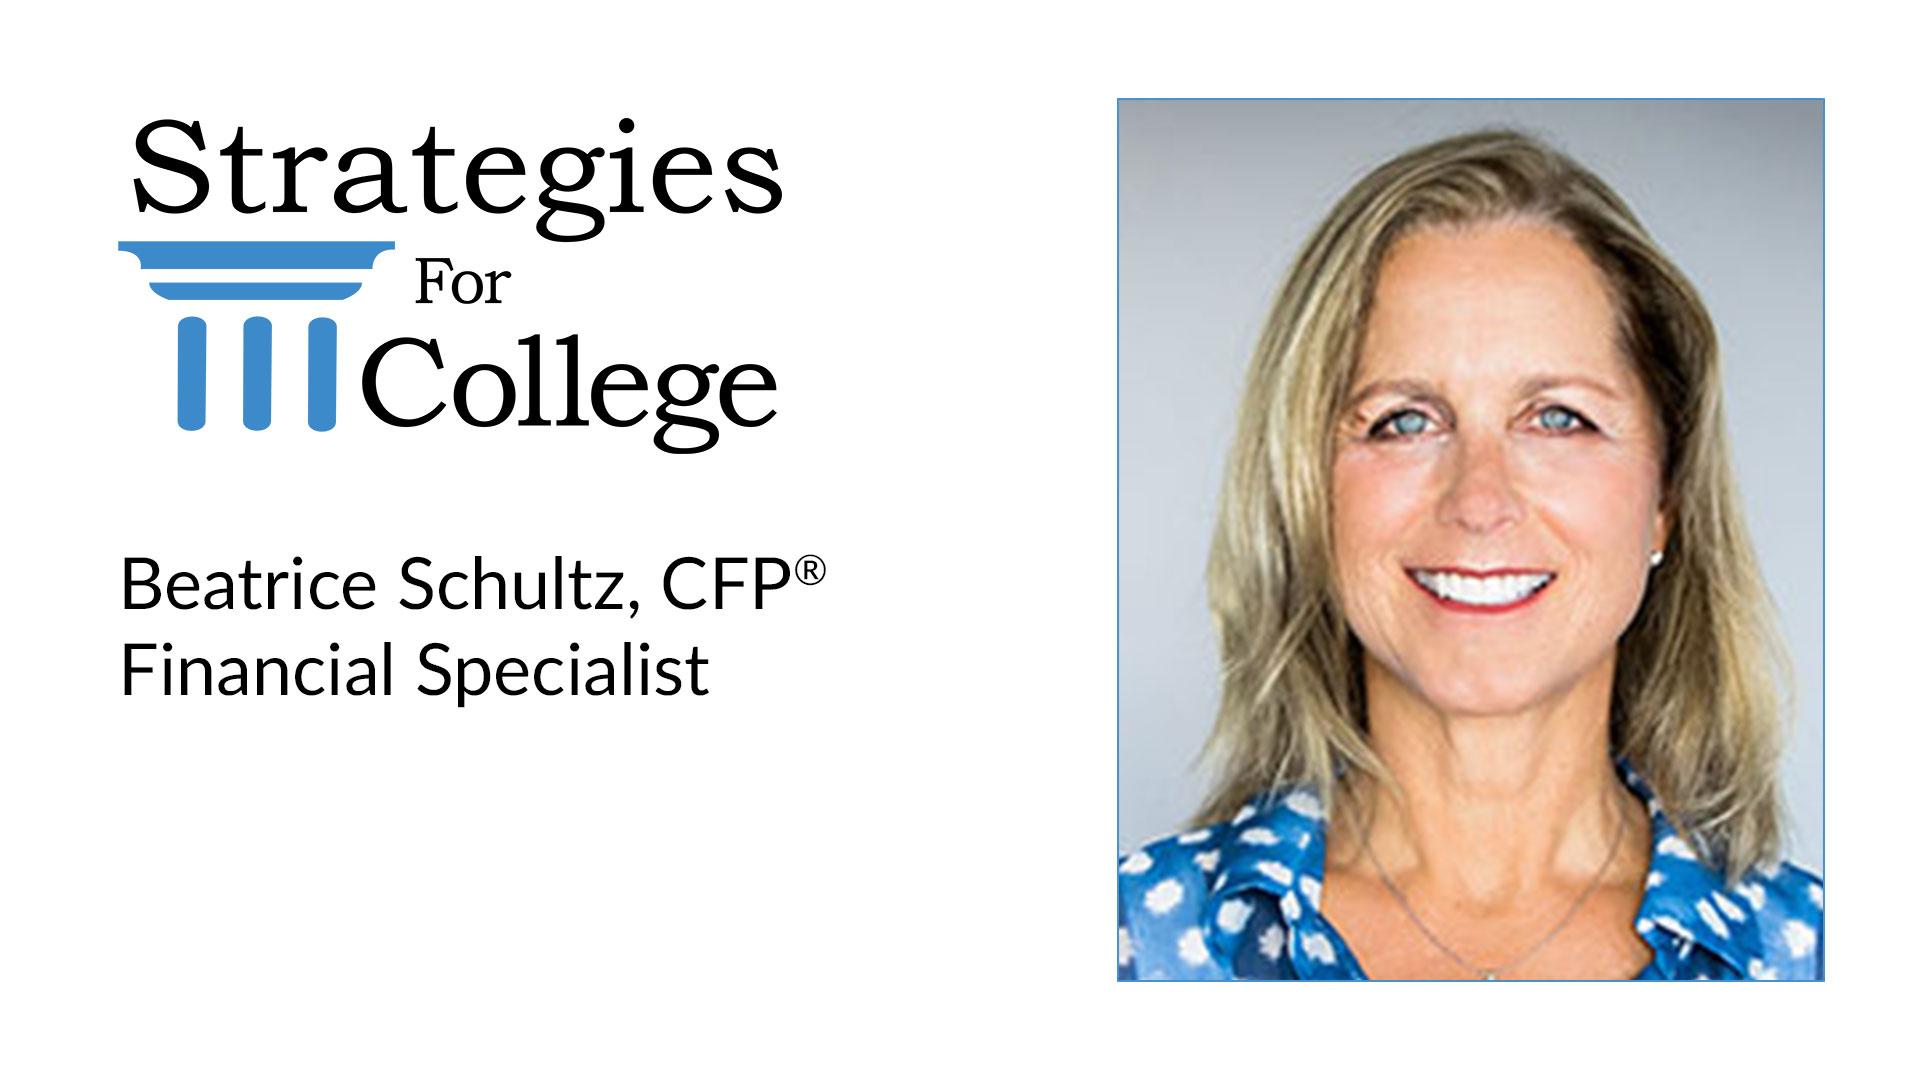 Beatrice Schultz, CFP